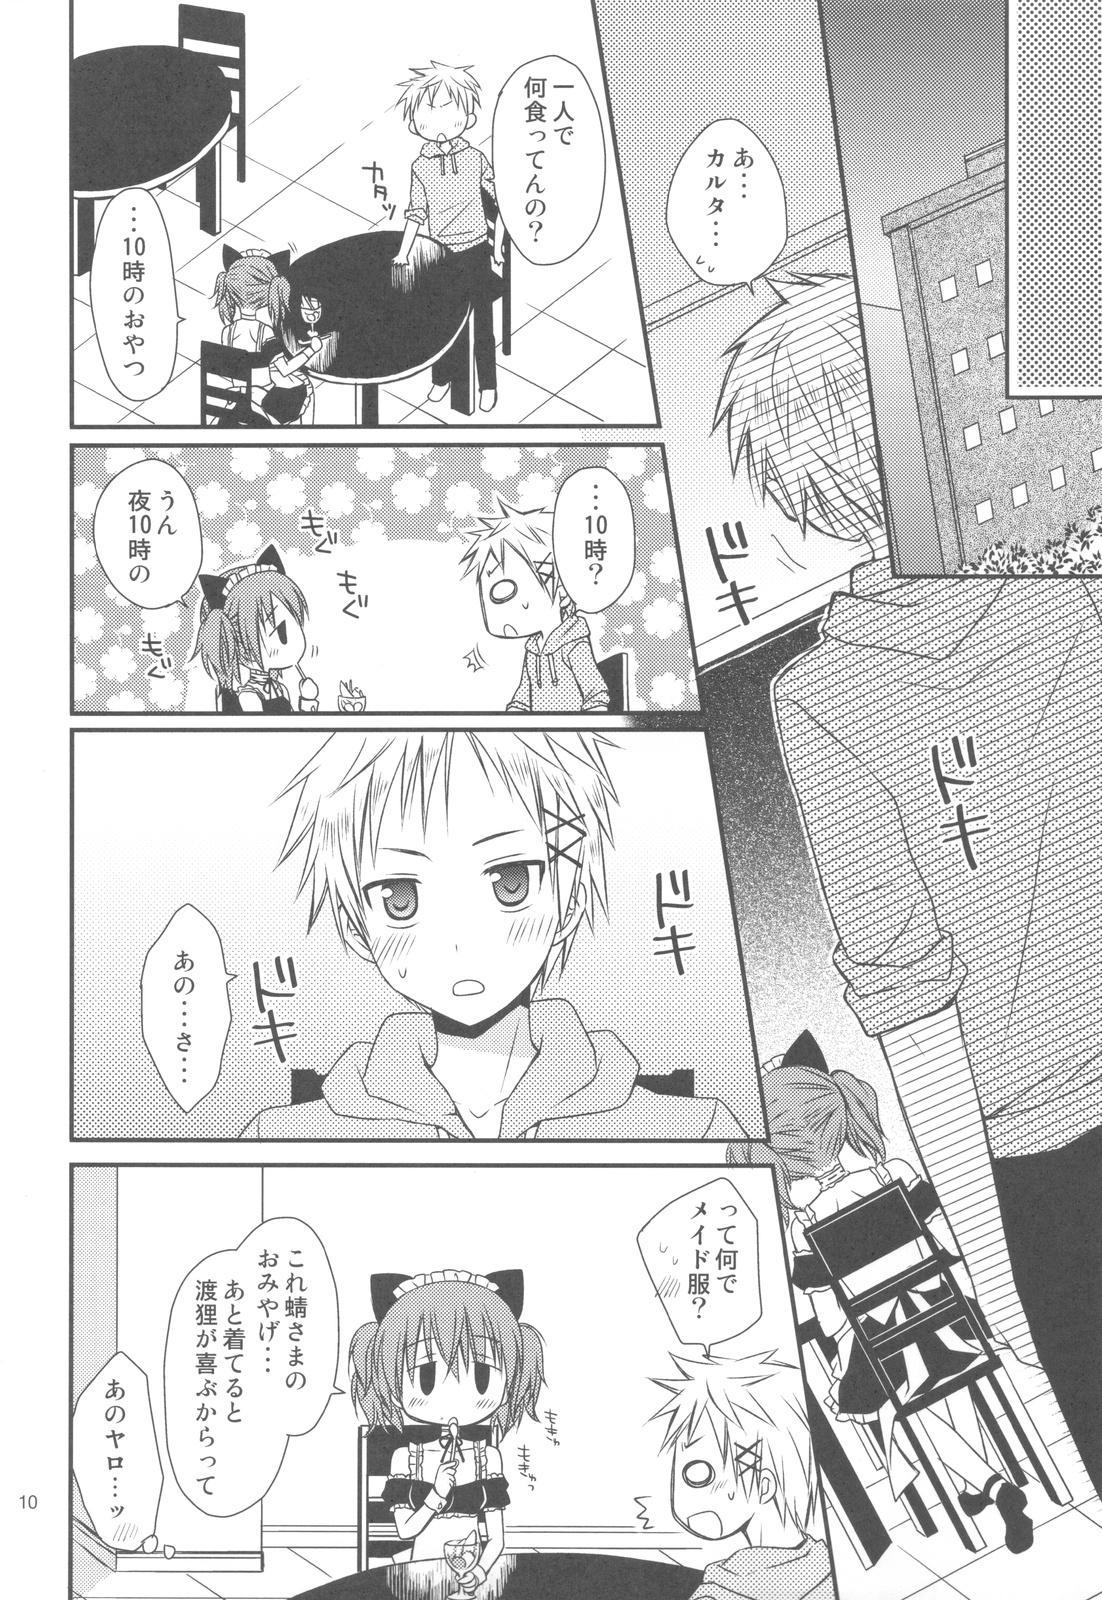 Chiisana Ai no Monogatari 8